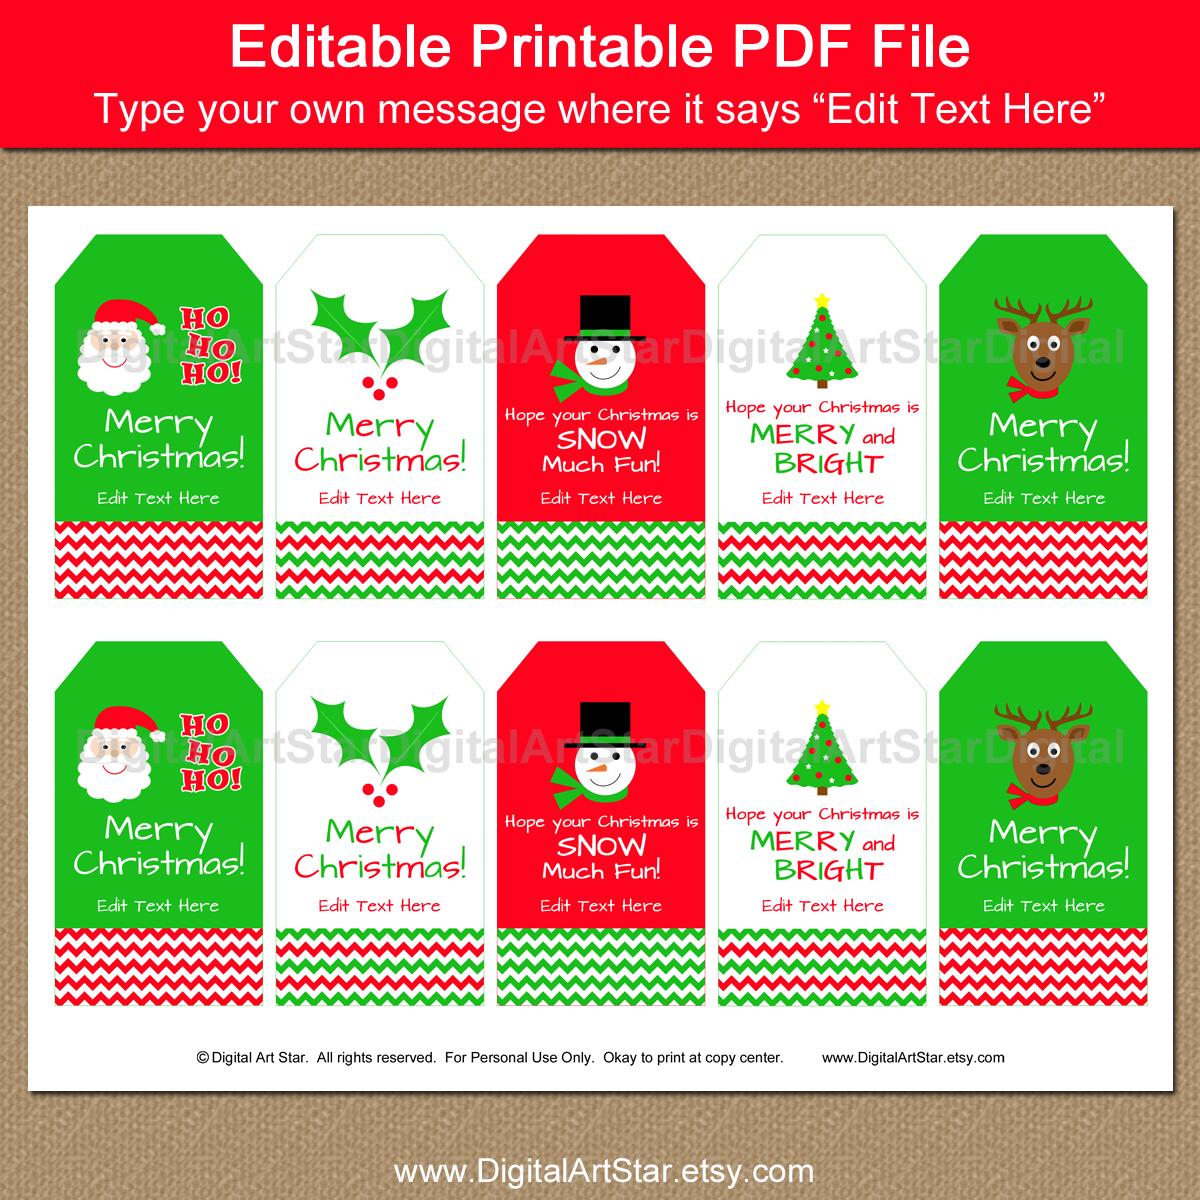 Digital Art Star: Printable Party Decor: Printable Christmas Chevron ...